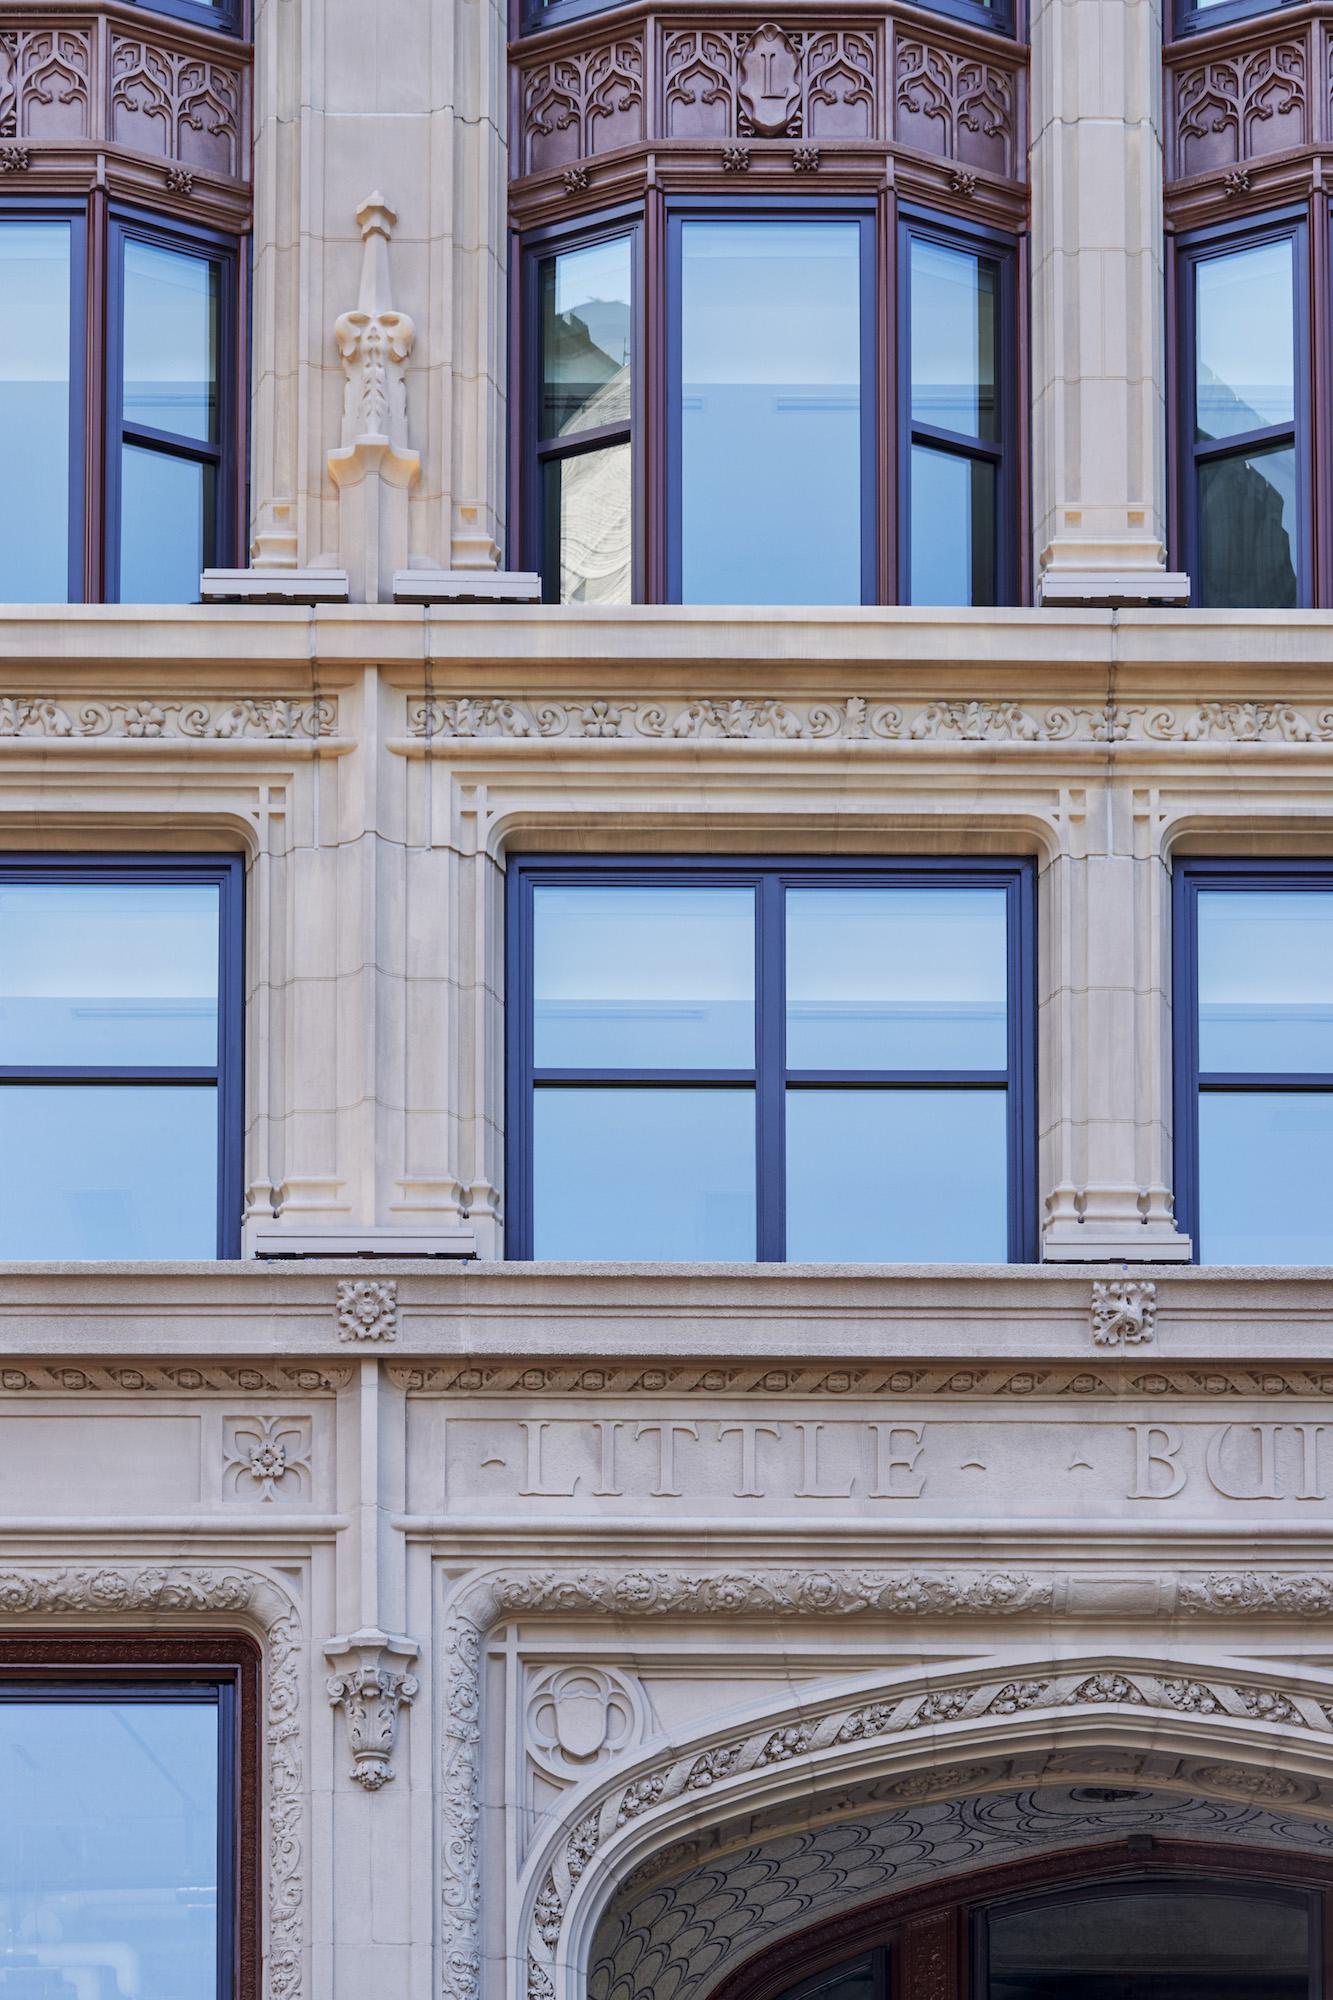 11_EmersonCollegeLittleBuilding_Detail-WindowAboveEntry_ElkusManfrediArchitects_©RobertBenson